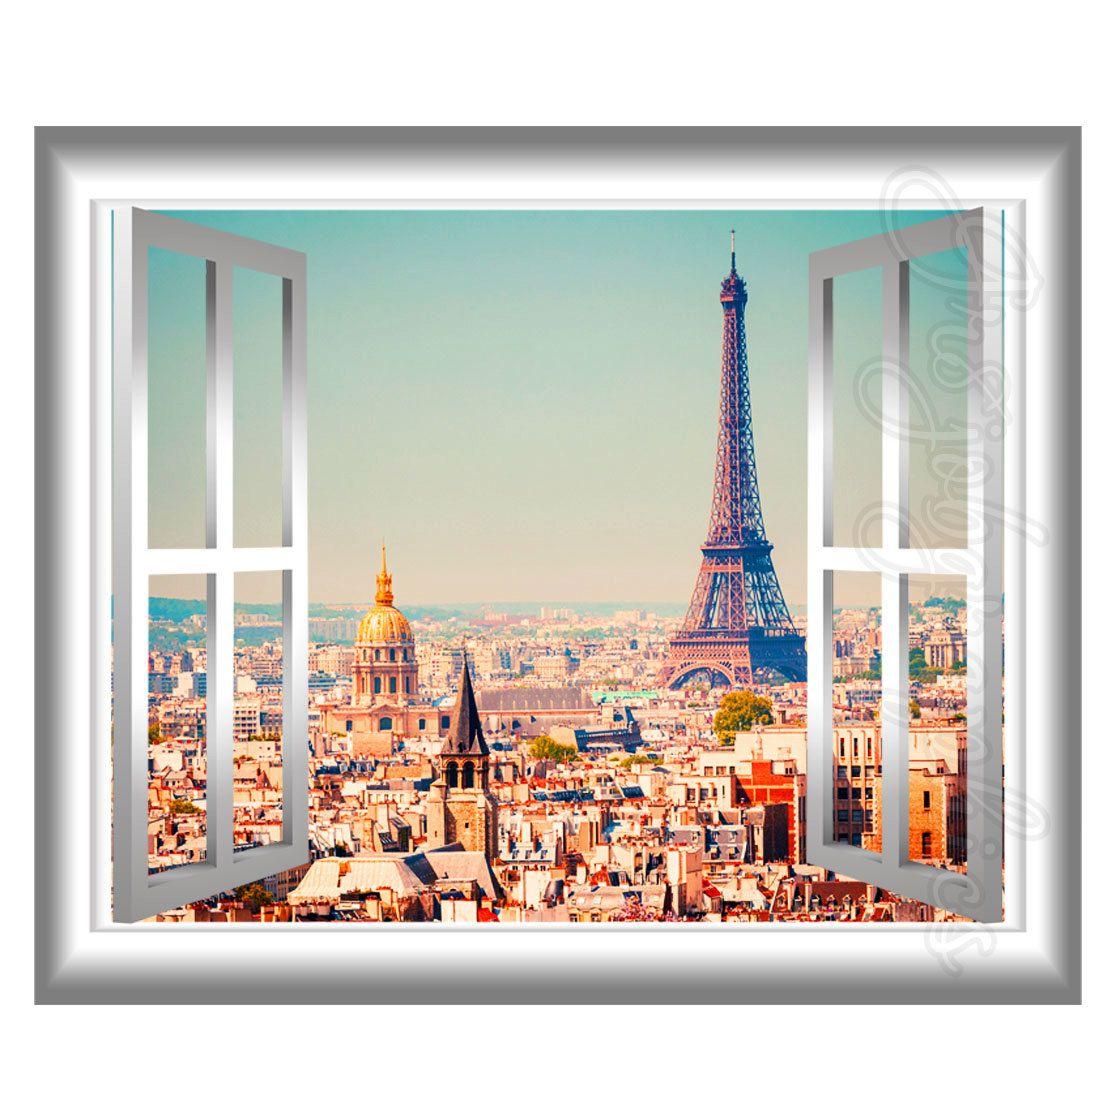 D Window Wall Decal Eiffel Tower Paris Home Decor France D Wall - 3d window wall decals